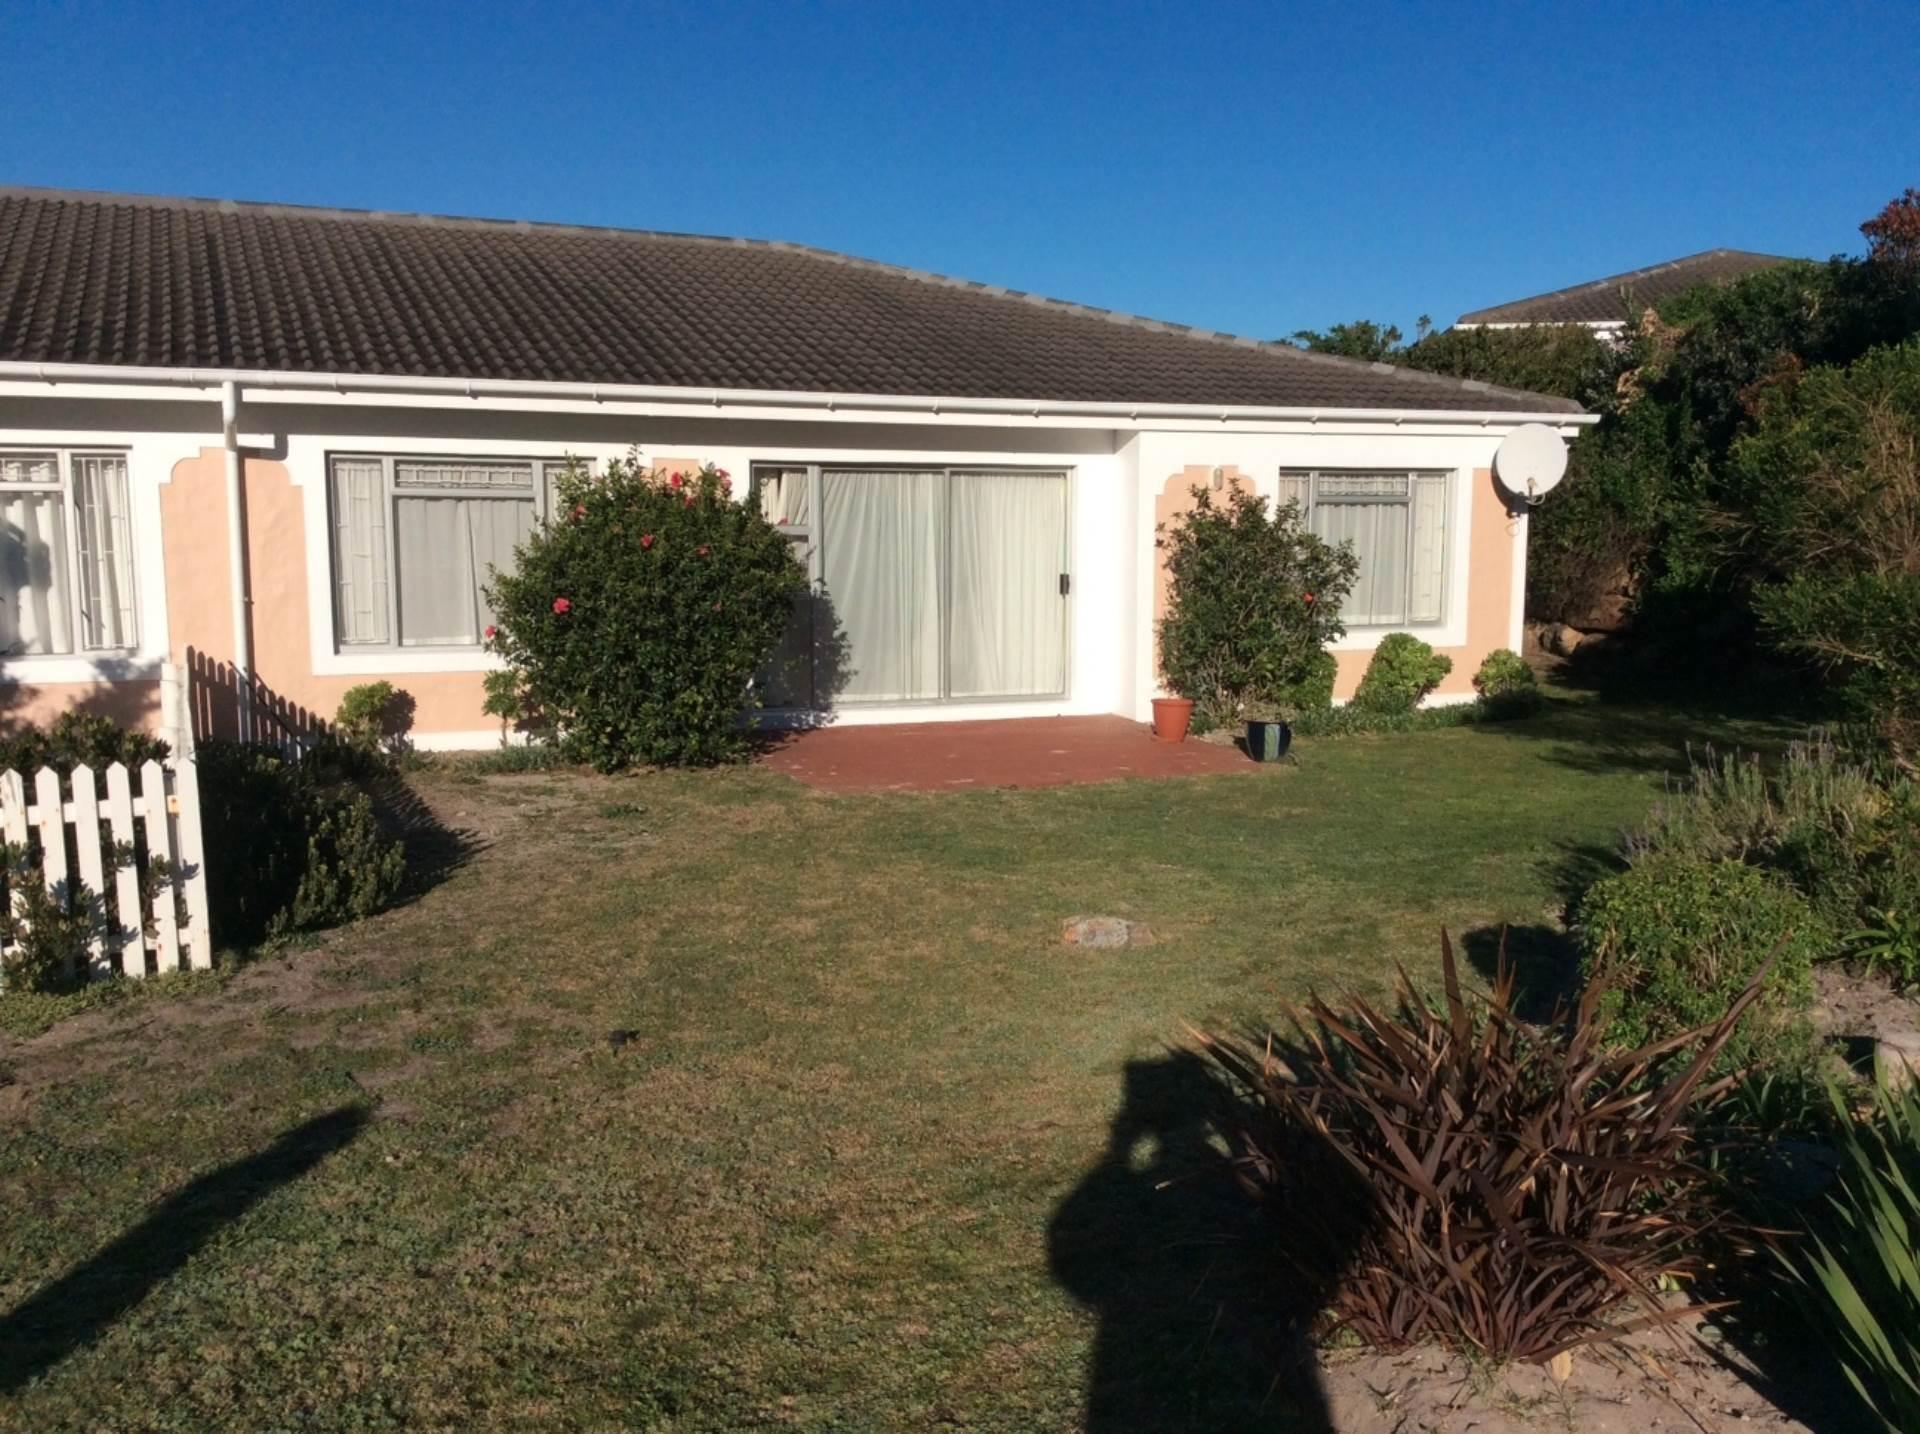 Property and Houses for sale in Noordhoek (All), Retirement Village, 2 Bedrooms - ZAR 2,800,000